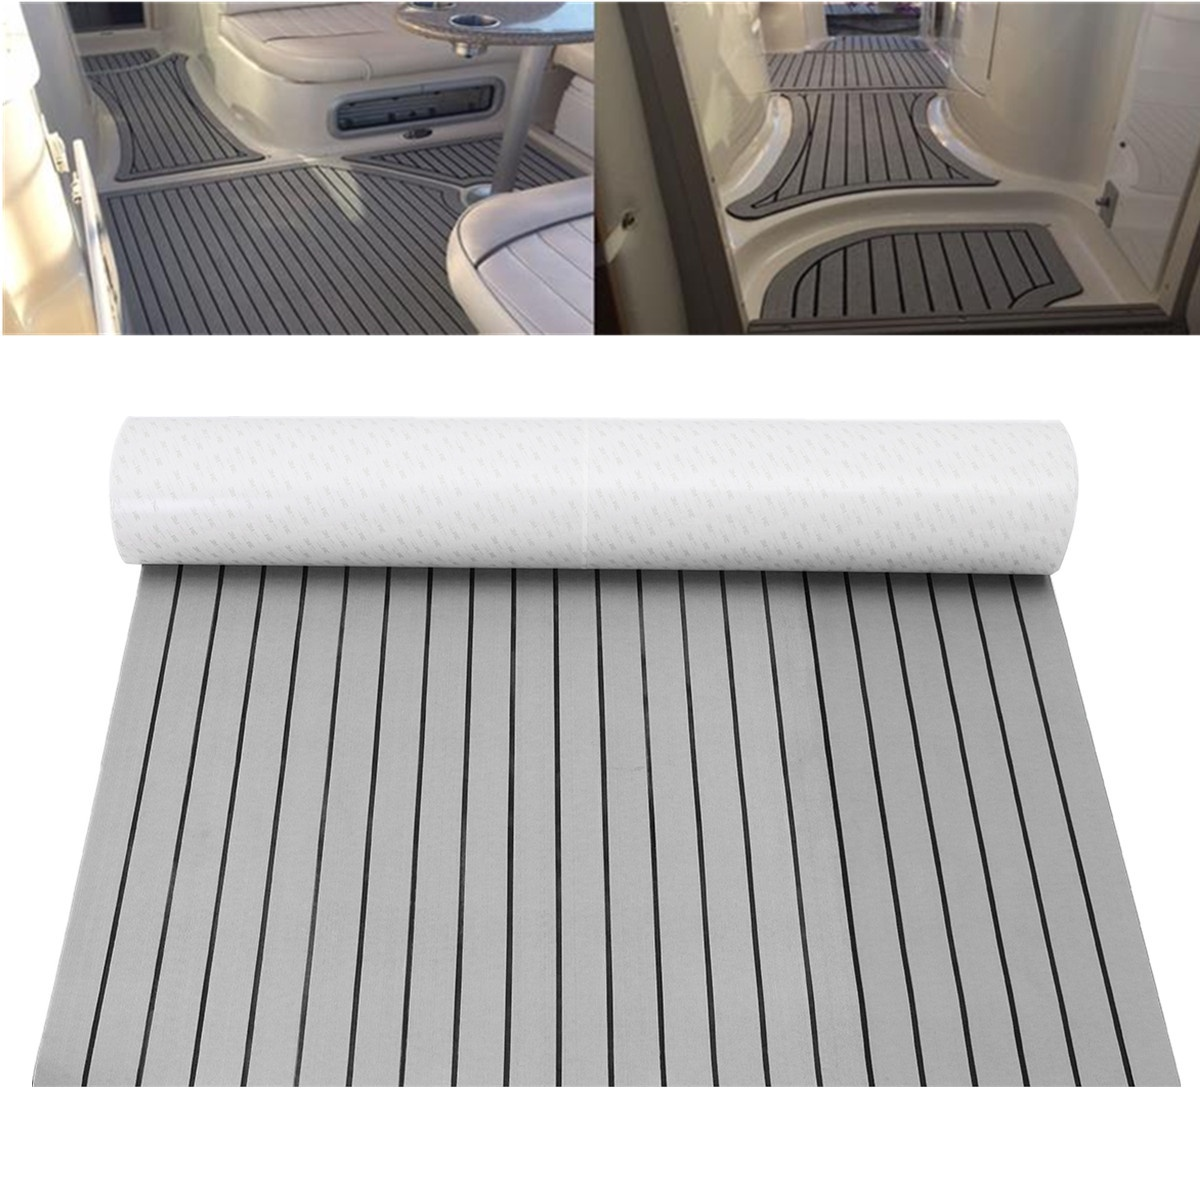 240cmx90cmx6mm Self Adhesive Marine EVA Foam Faux Teak Sheet Boat Yacht Synthetic Teak Decking Sheet Pad Foam Floor Mat Grey